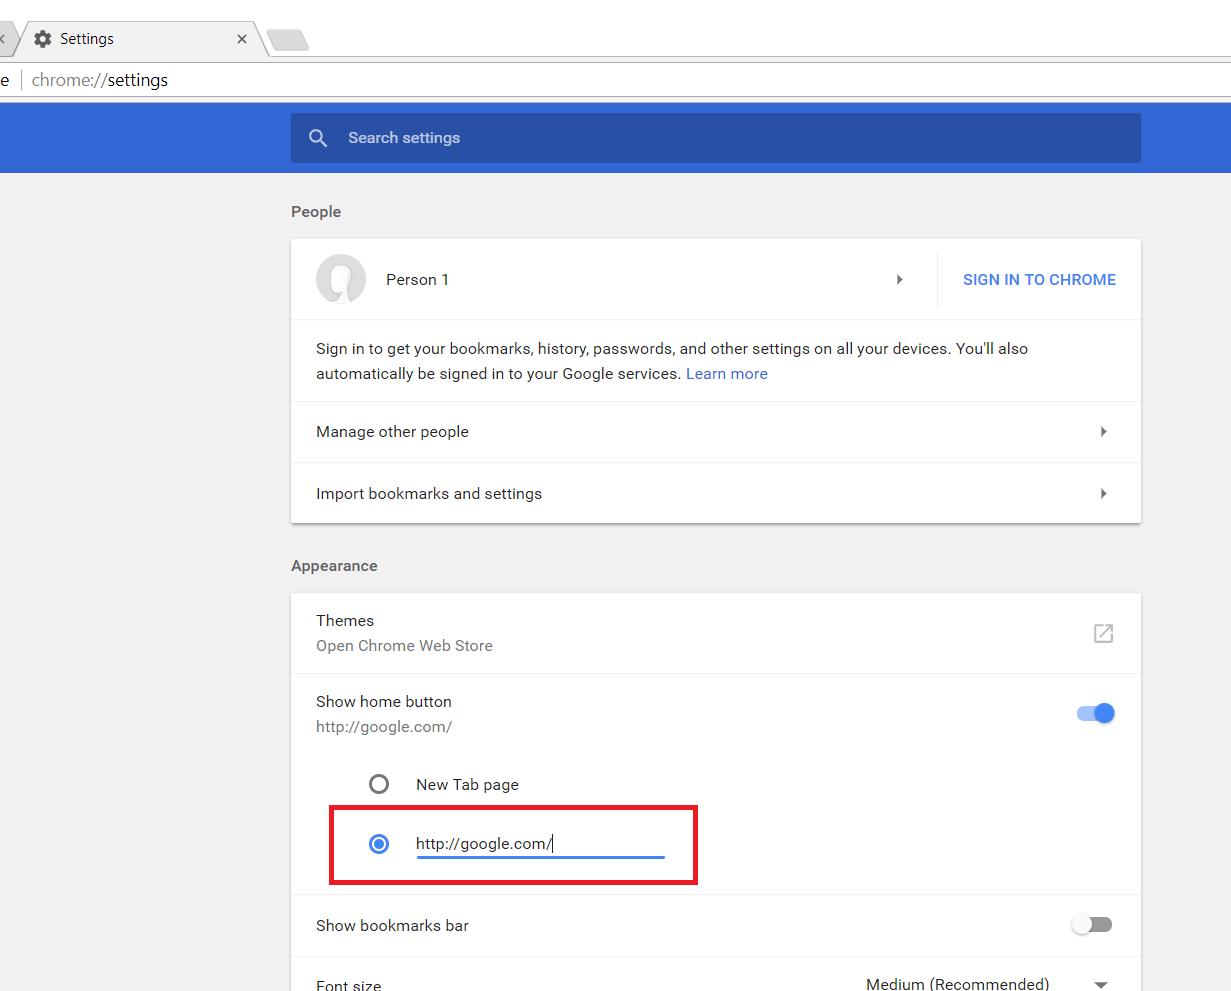 type google.com in homepage URL